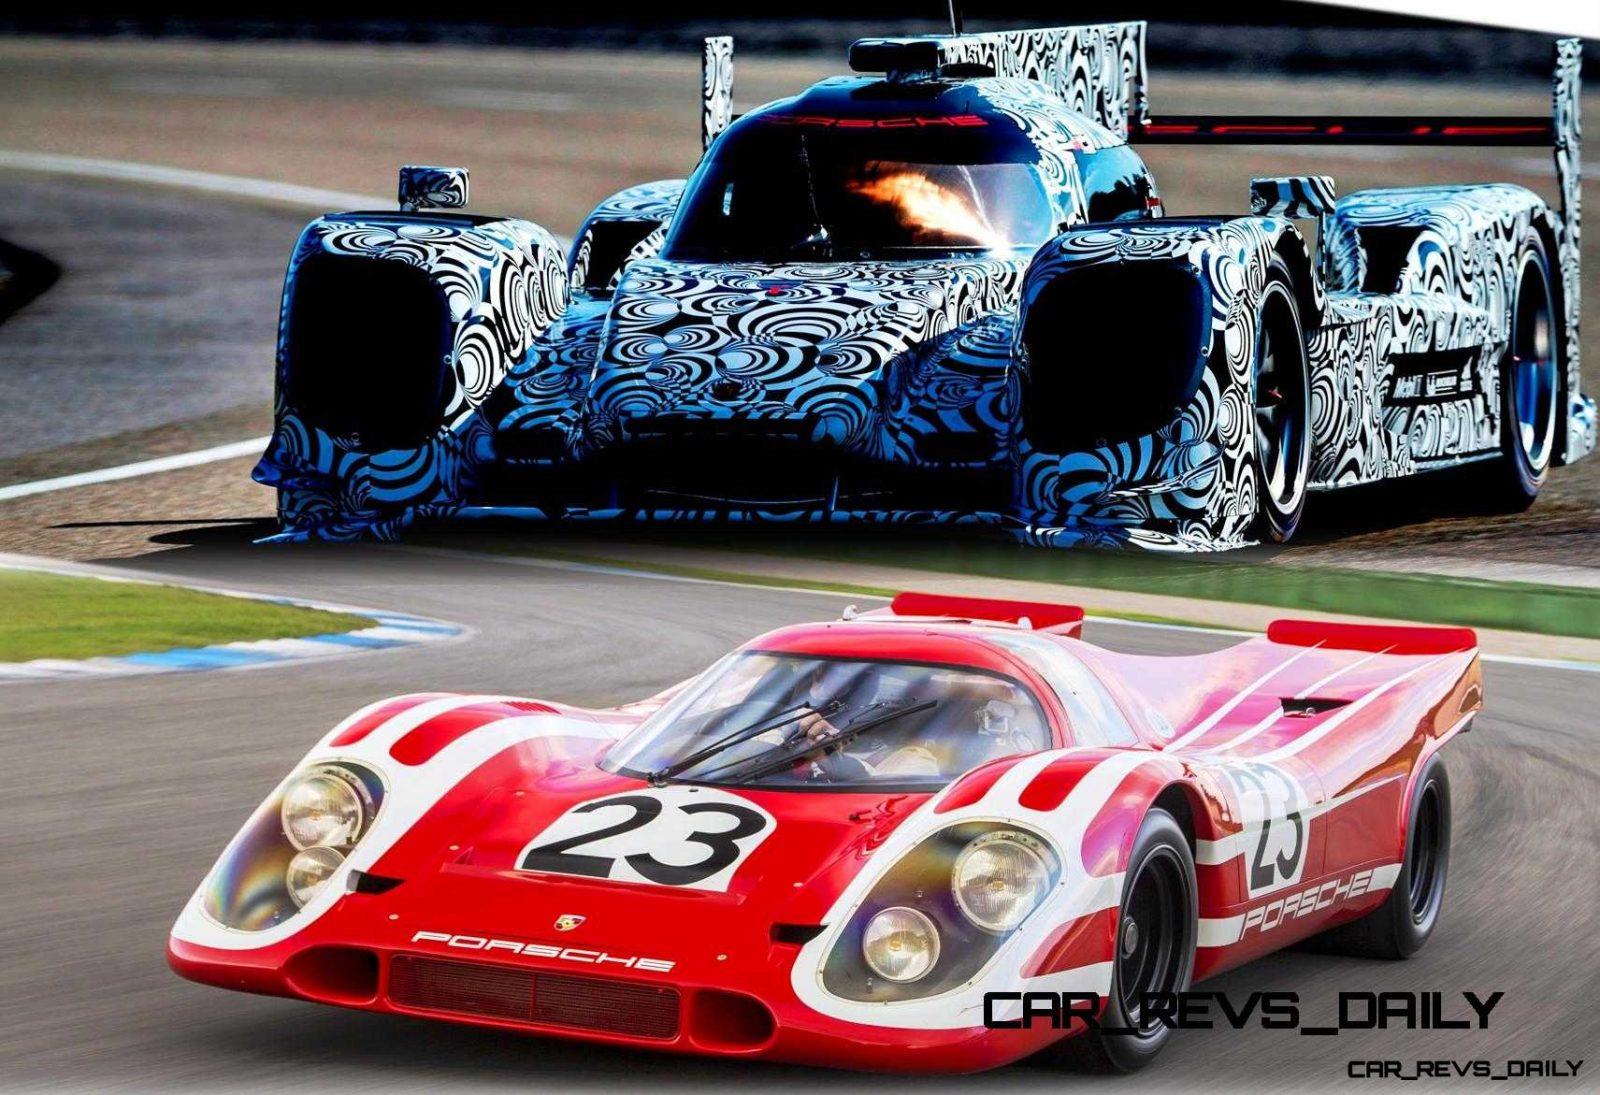 CarRevsDaily - Porsche 917 and 2014 LMP1